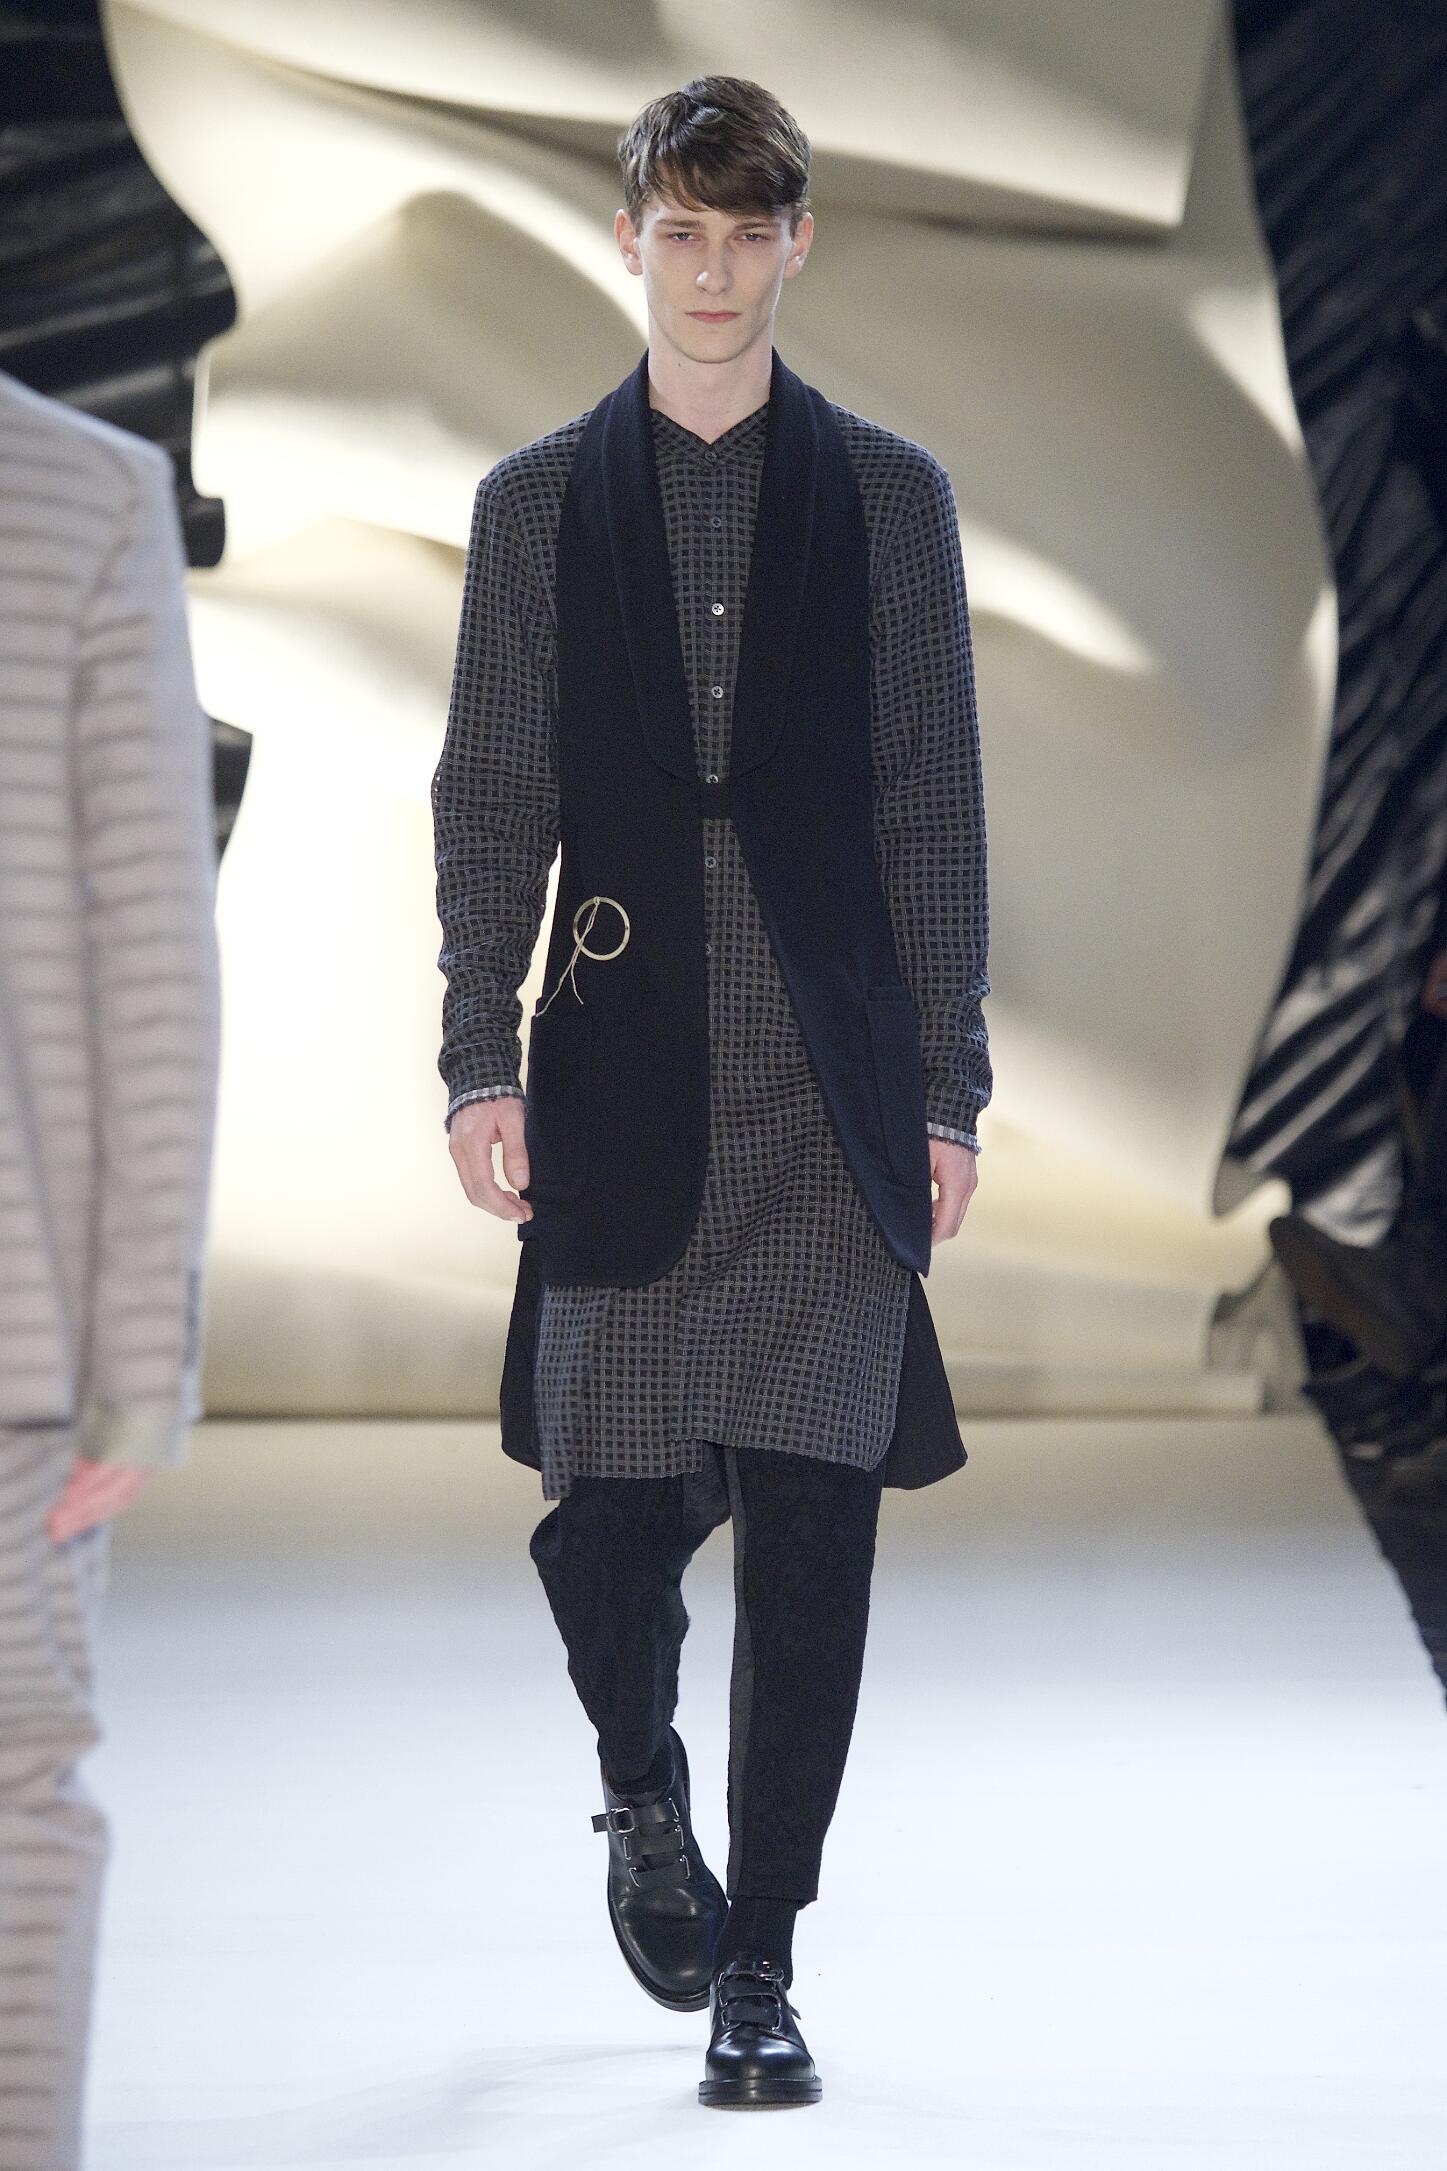 Fashion Man Model Damir Doma Collection Catwalk